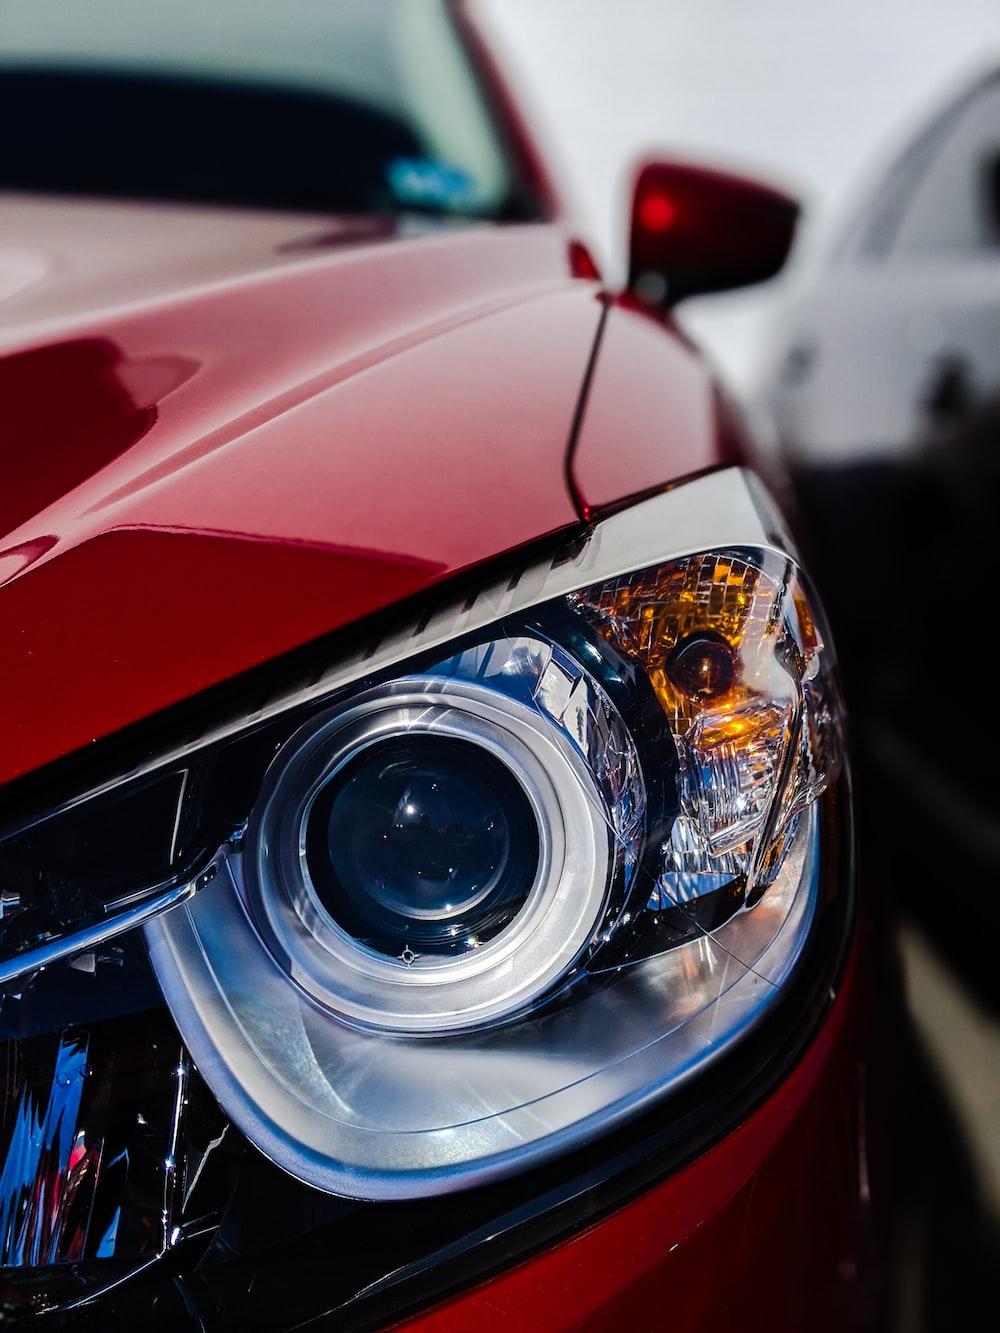 red vehicle headlight